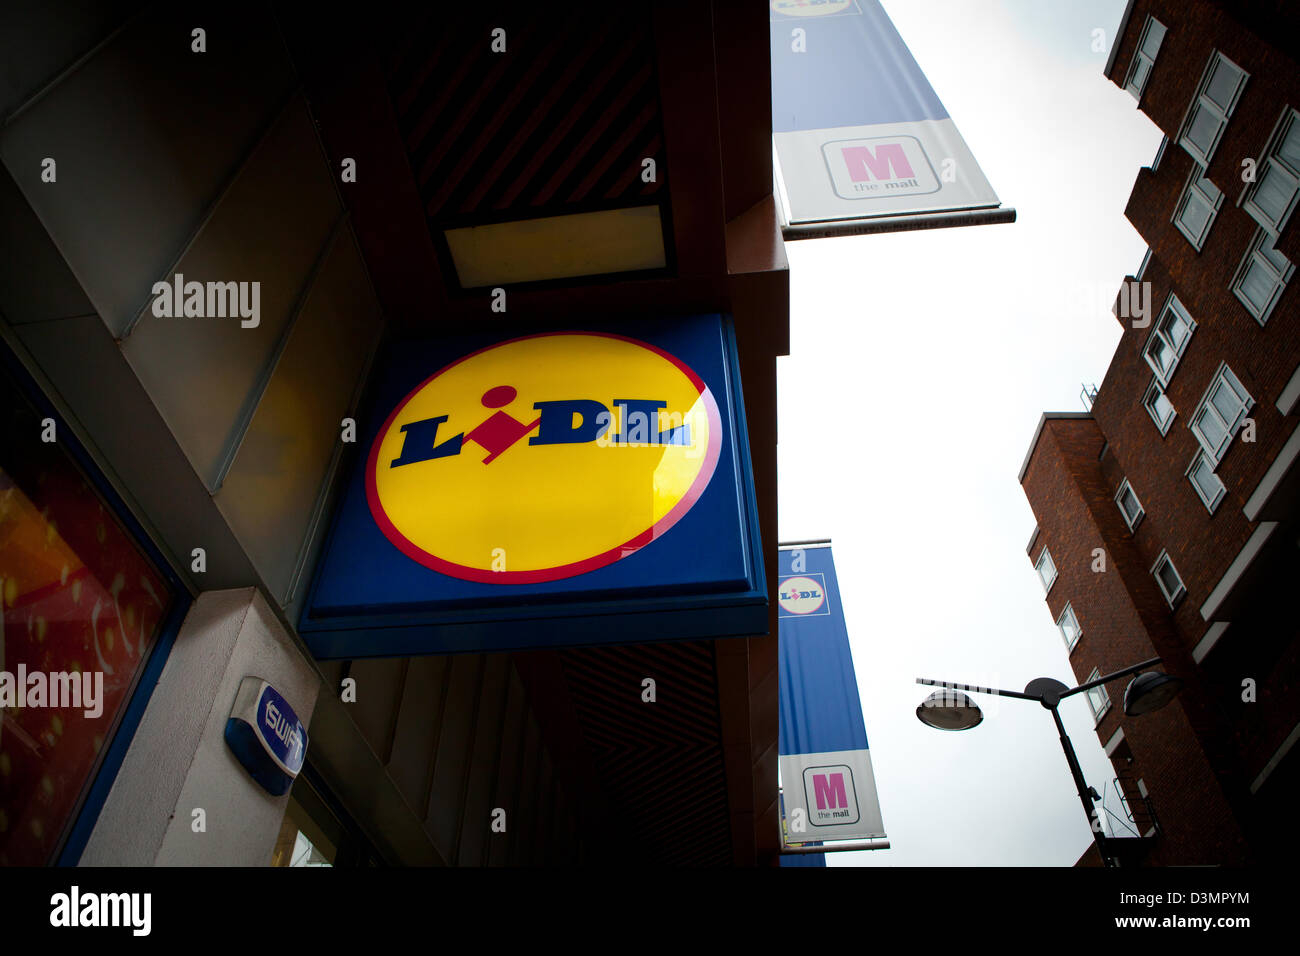 Lidl Supermarket Stock Photo 53932136 - Alamy-1681